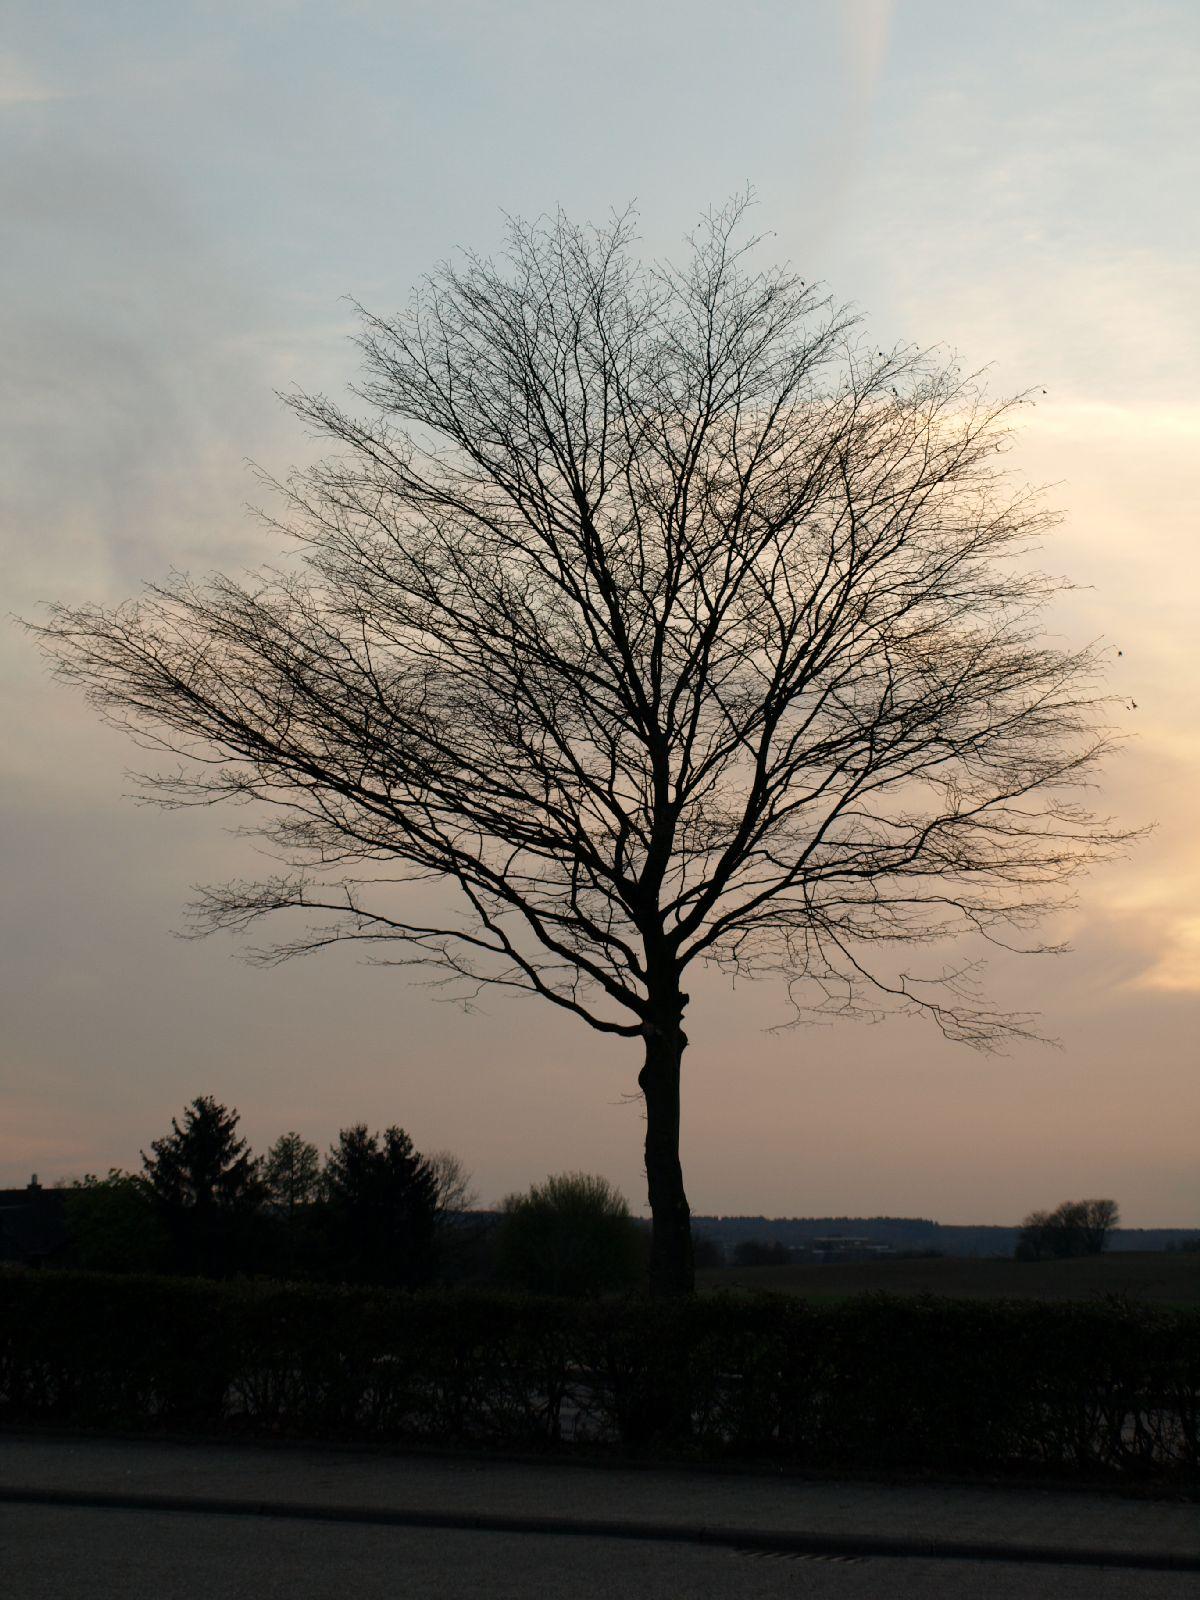 Pflanzen-Baum-Silhouette-Foto_Textur_B_P4171367